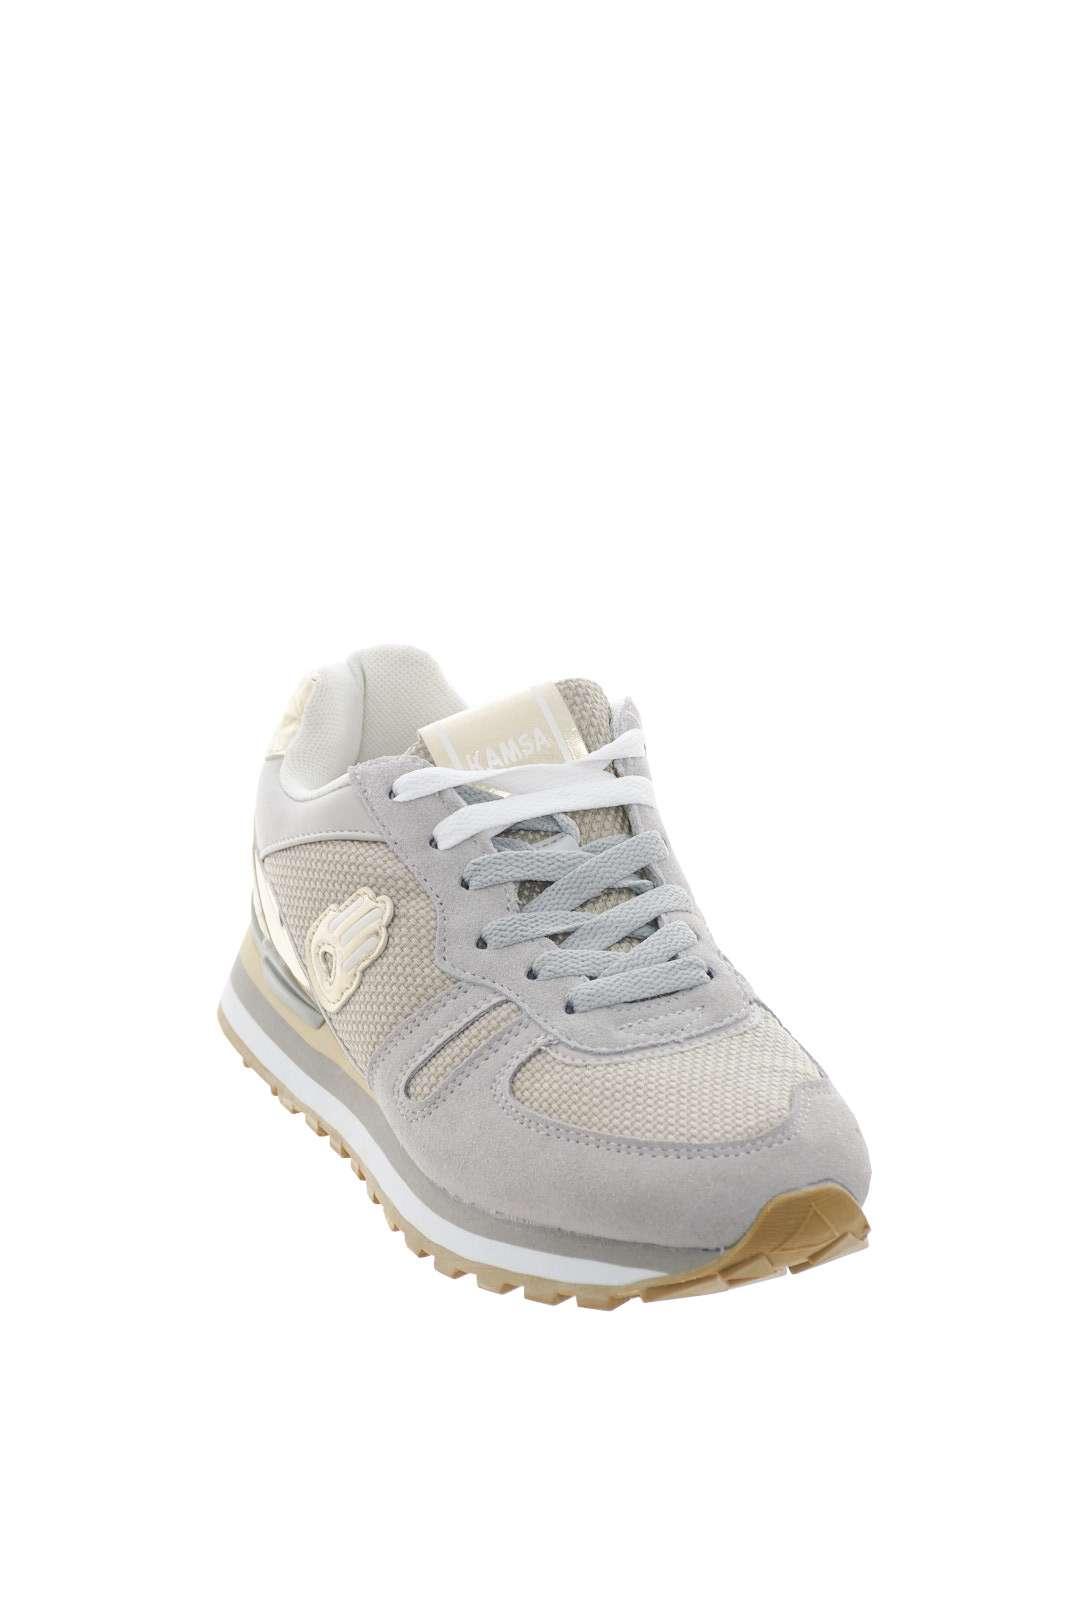 https://www.parmax.com/media/catalog/product/a/i/PE-outlet_parmax-sneaker-donna-Kamsa-KAMSAT-C.jpg